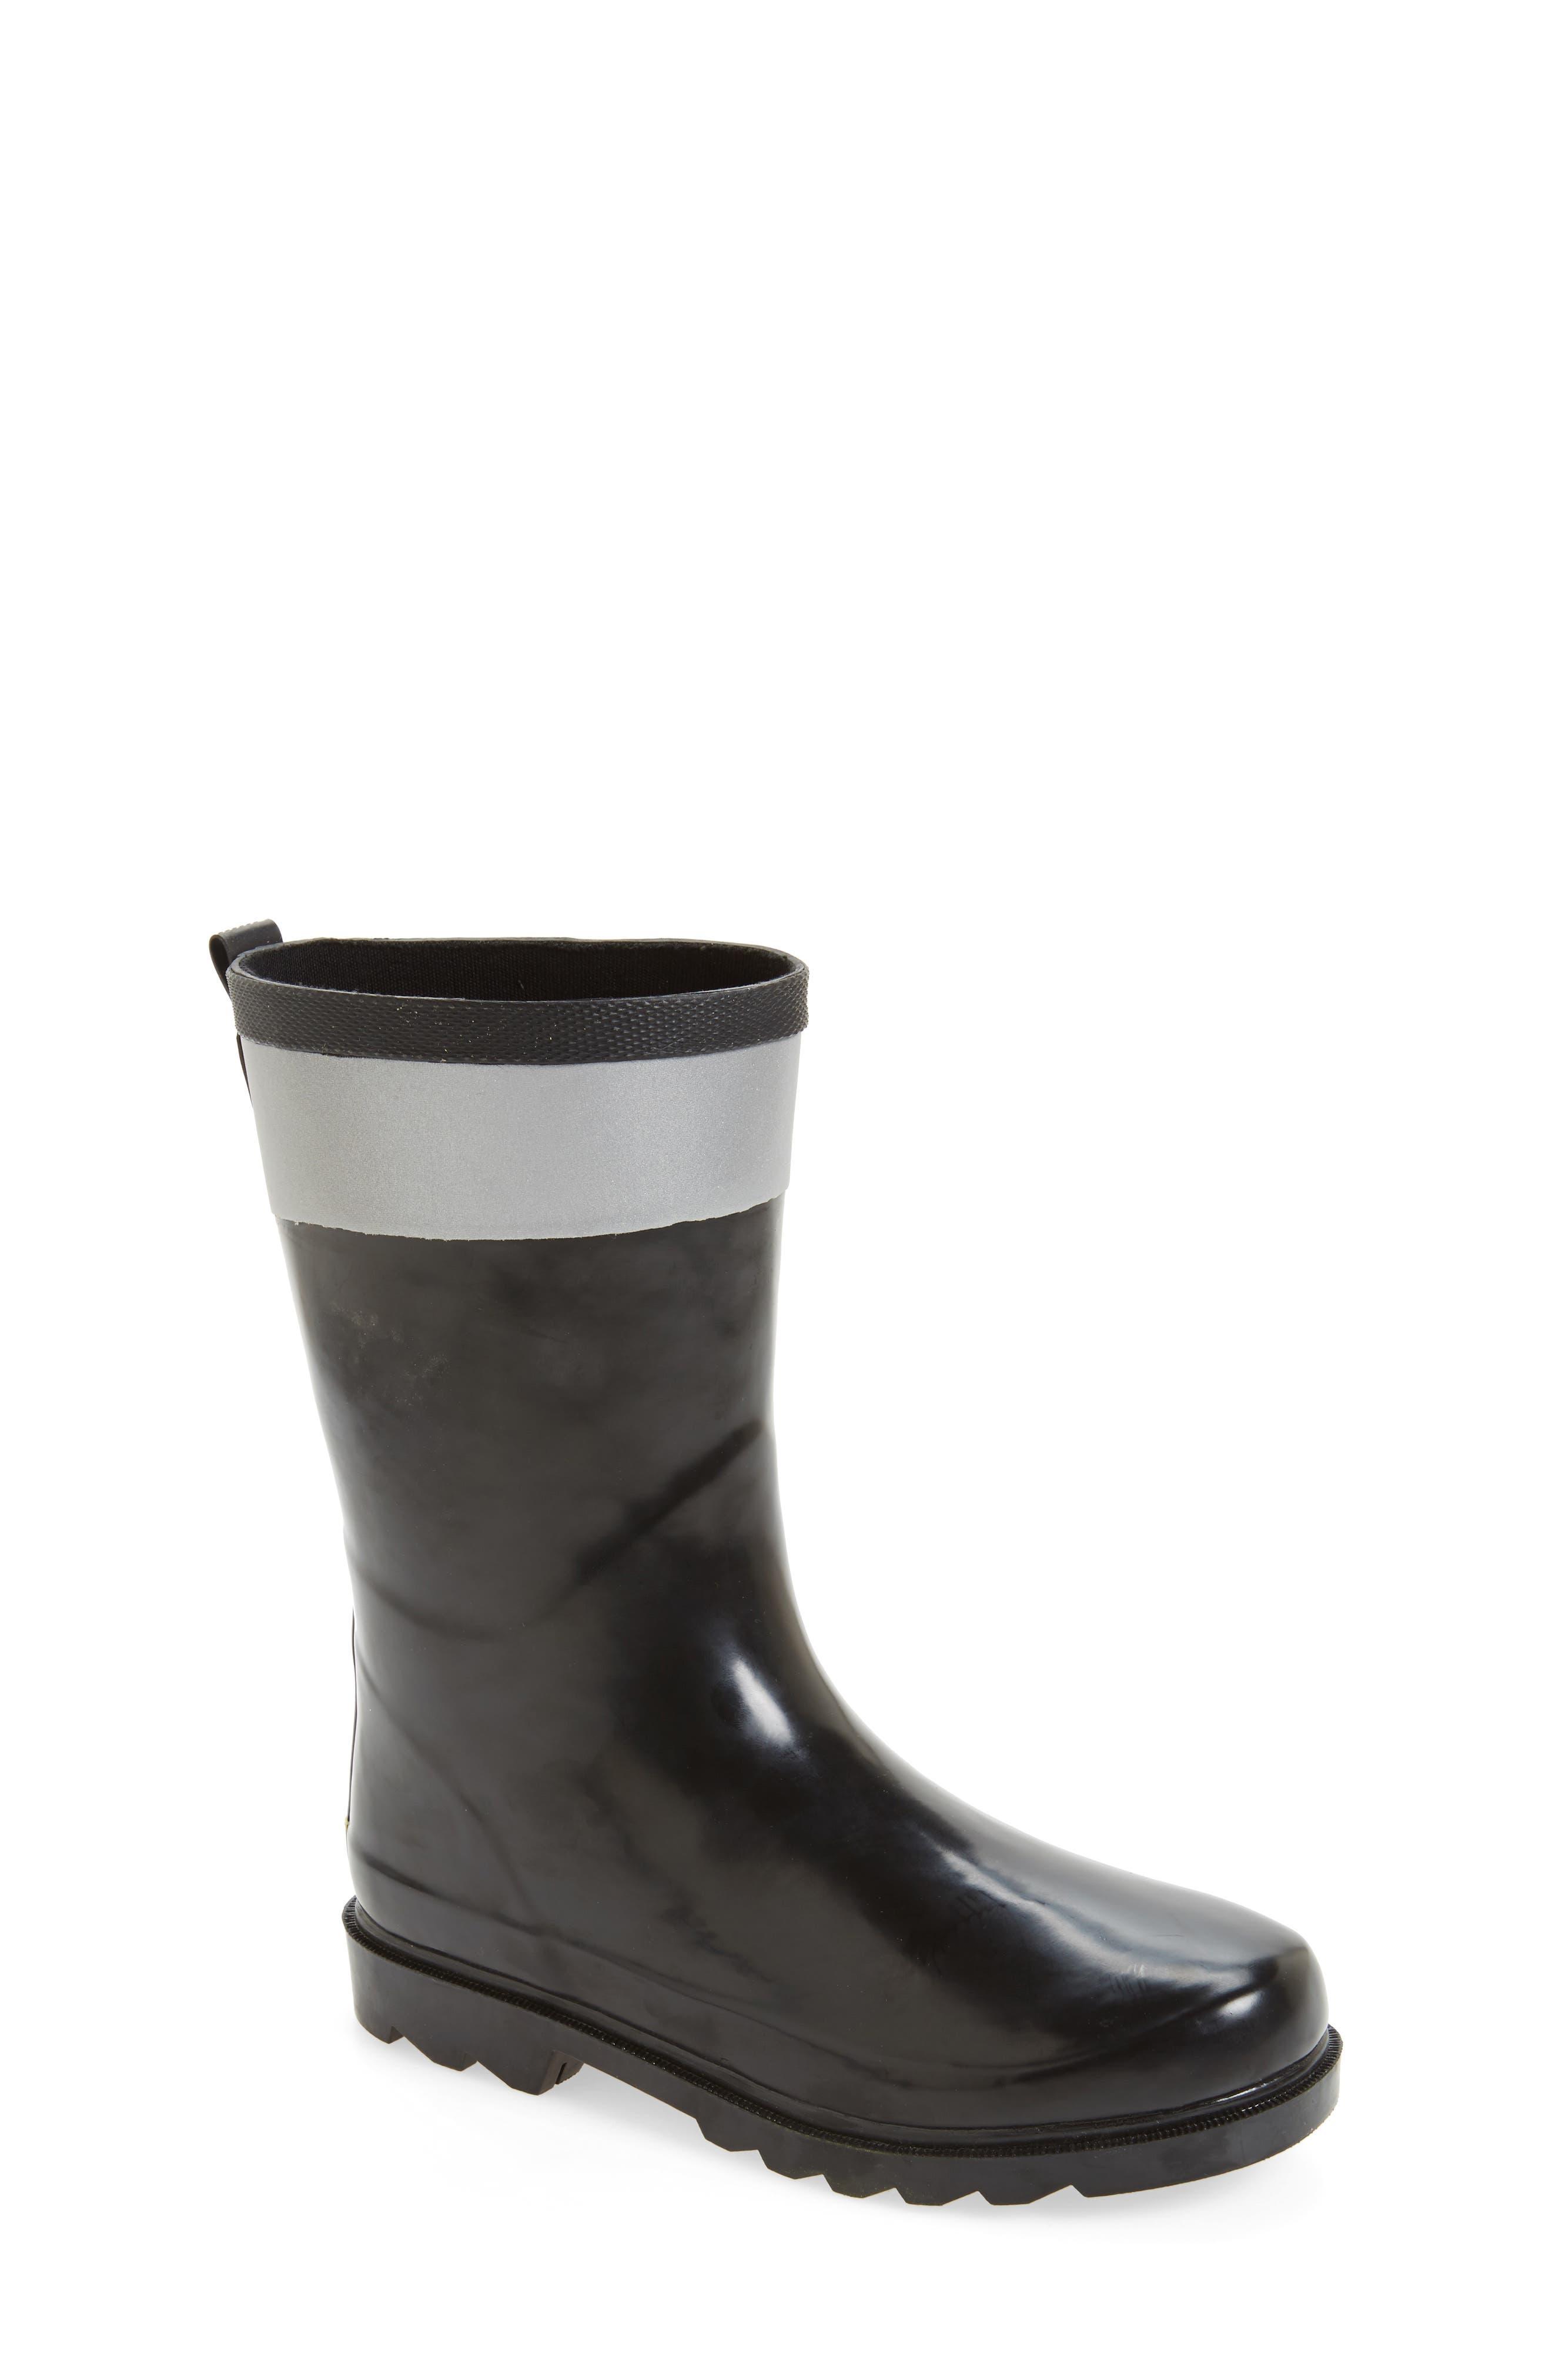 WESTERN CHIEF Reflective Rain Boot